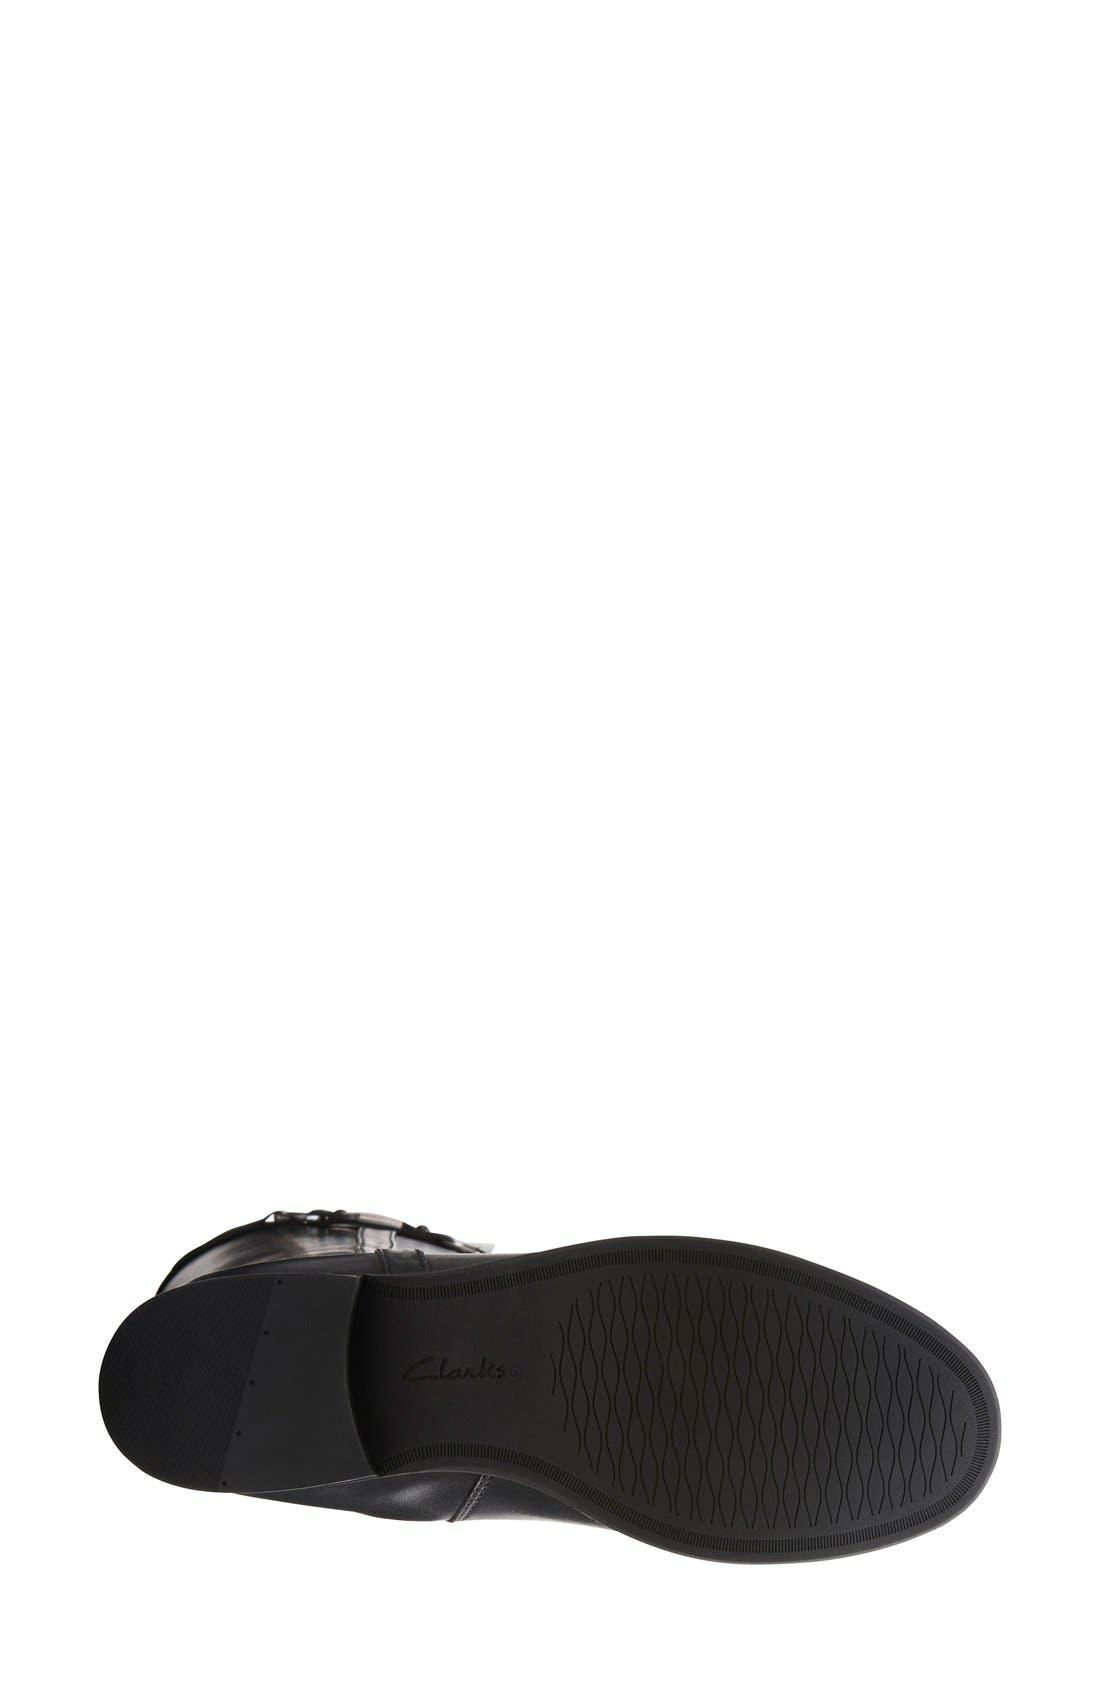 'Pita Topeka' WaterproofRiding Boot,                             Alternate thumbnail 2, color,                             003